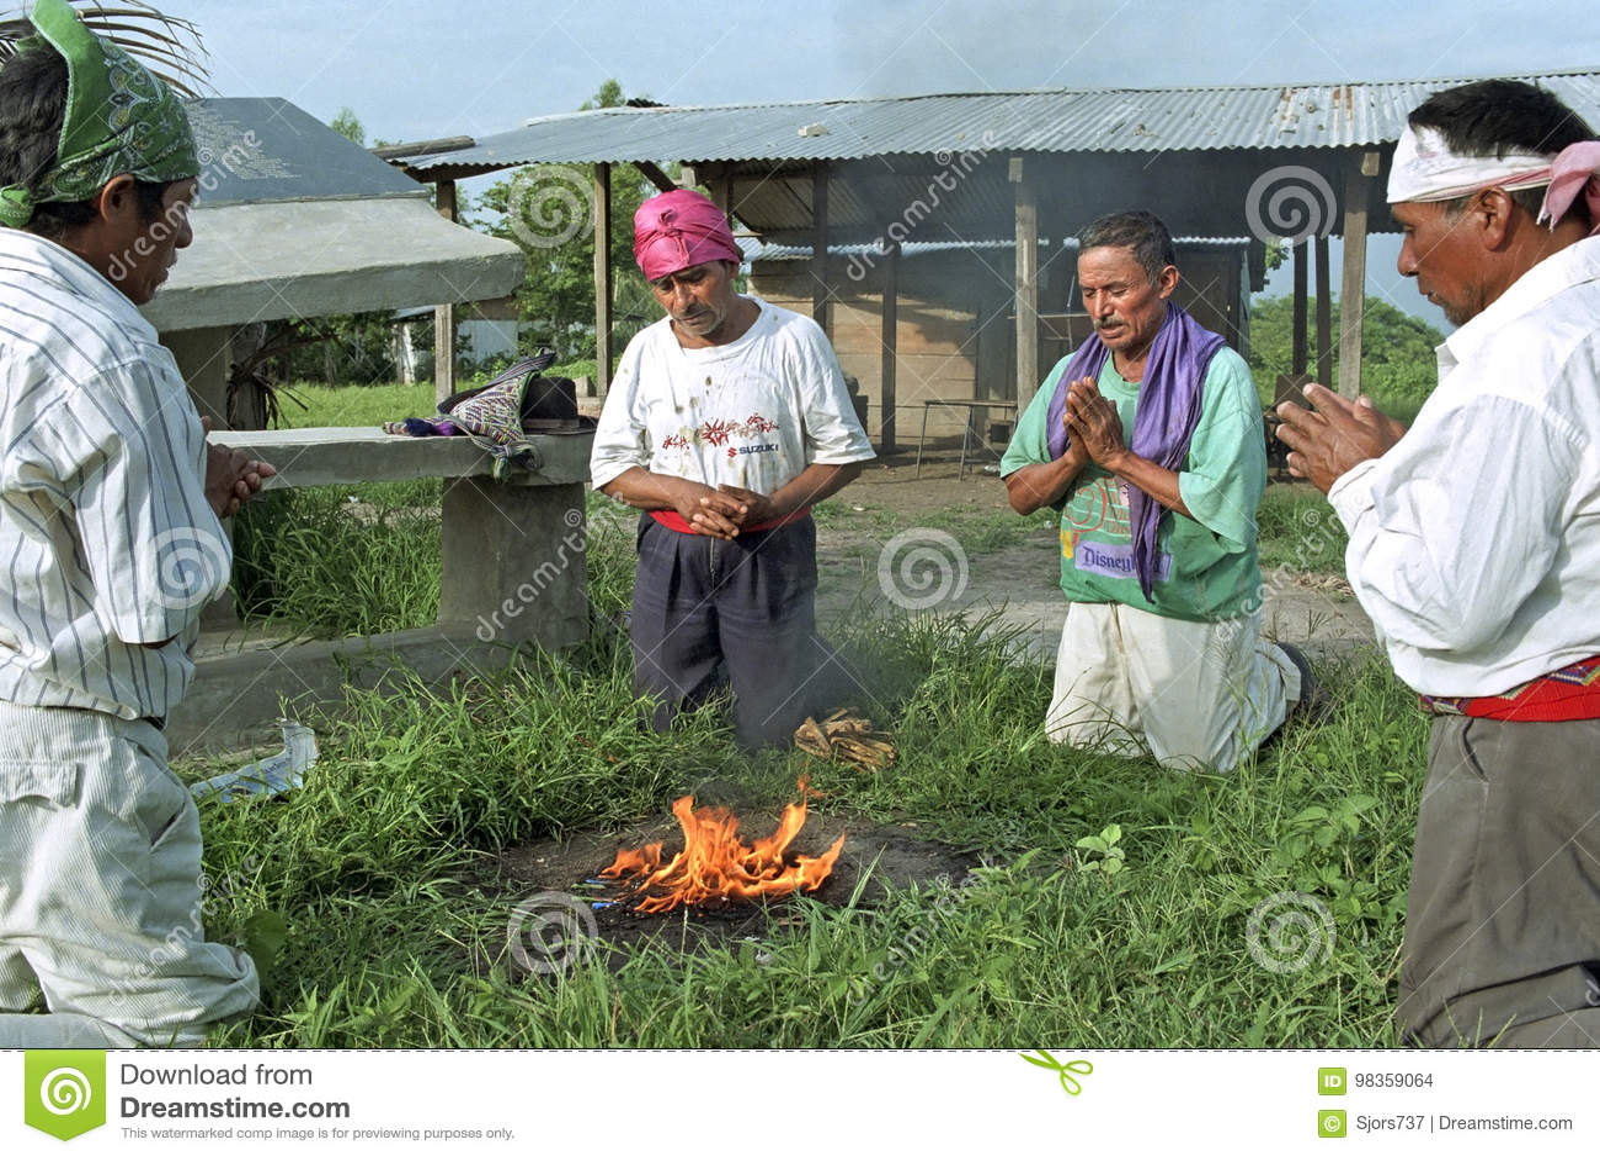 Religious ritual of Guatemalan Ixil Indian priests